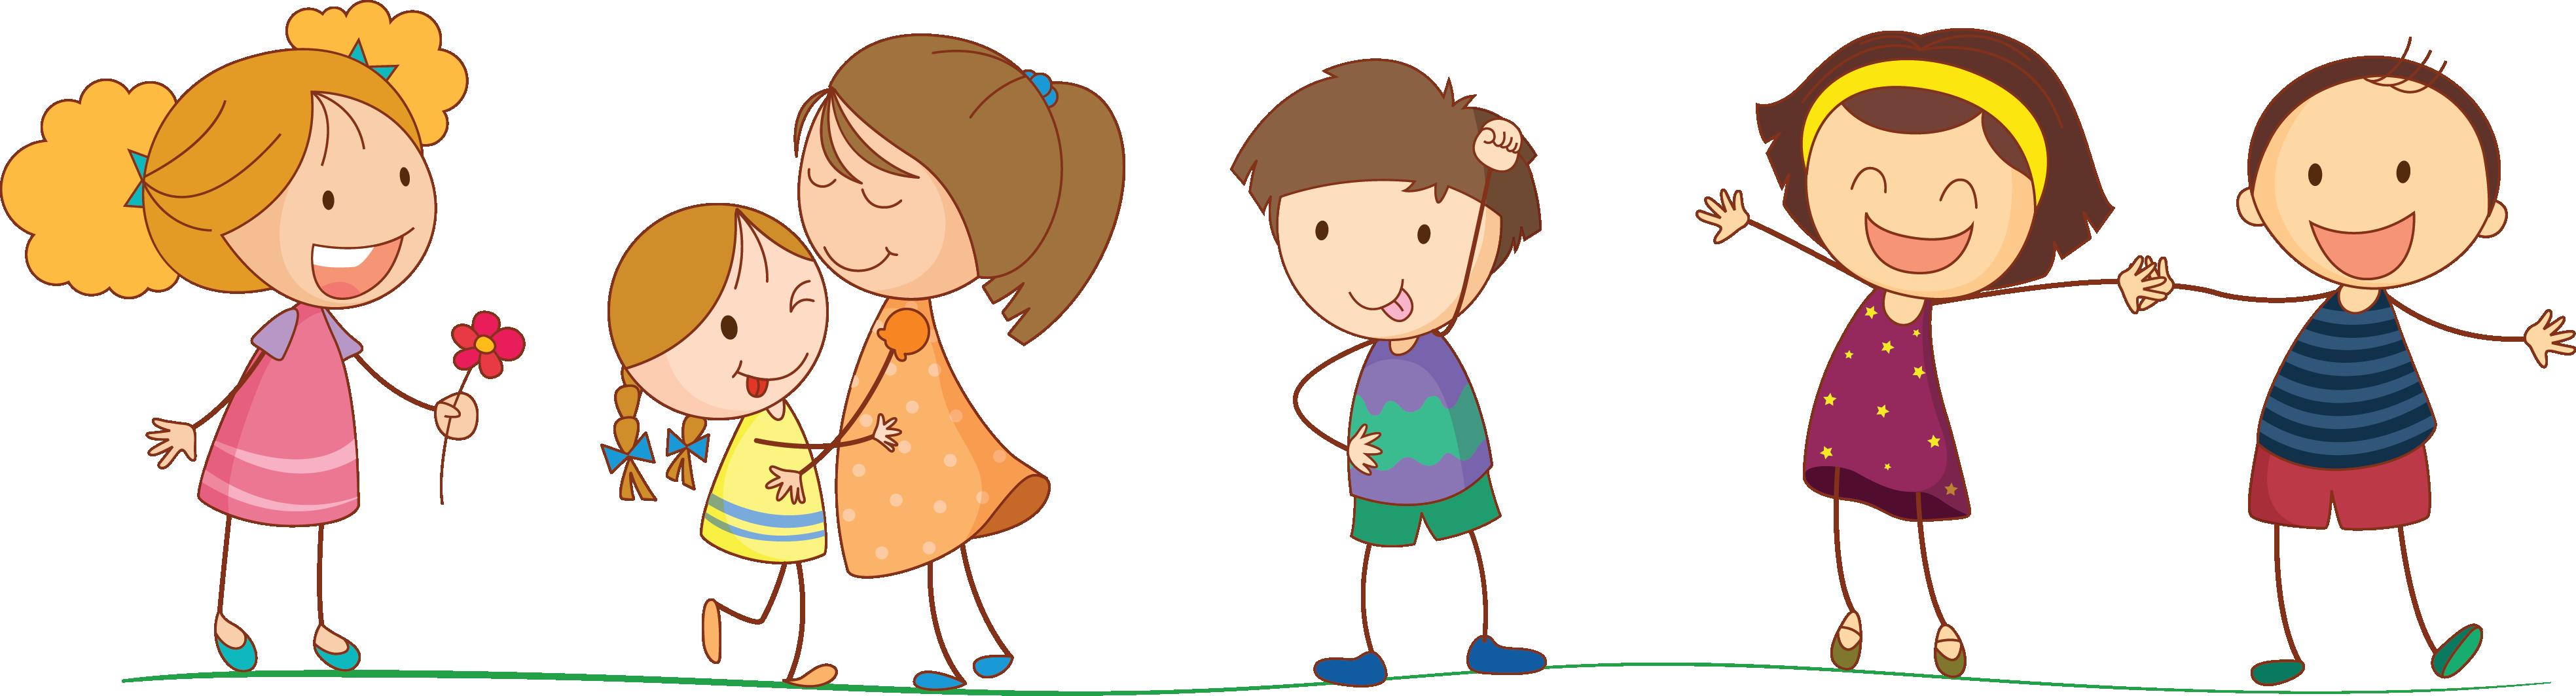 Kids PNG Transparent Images.